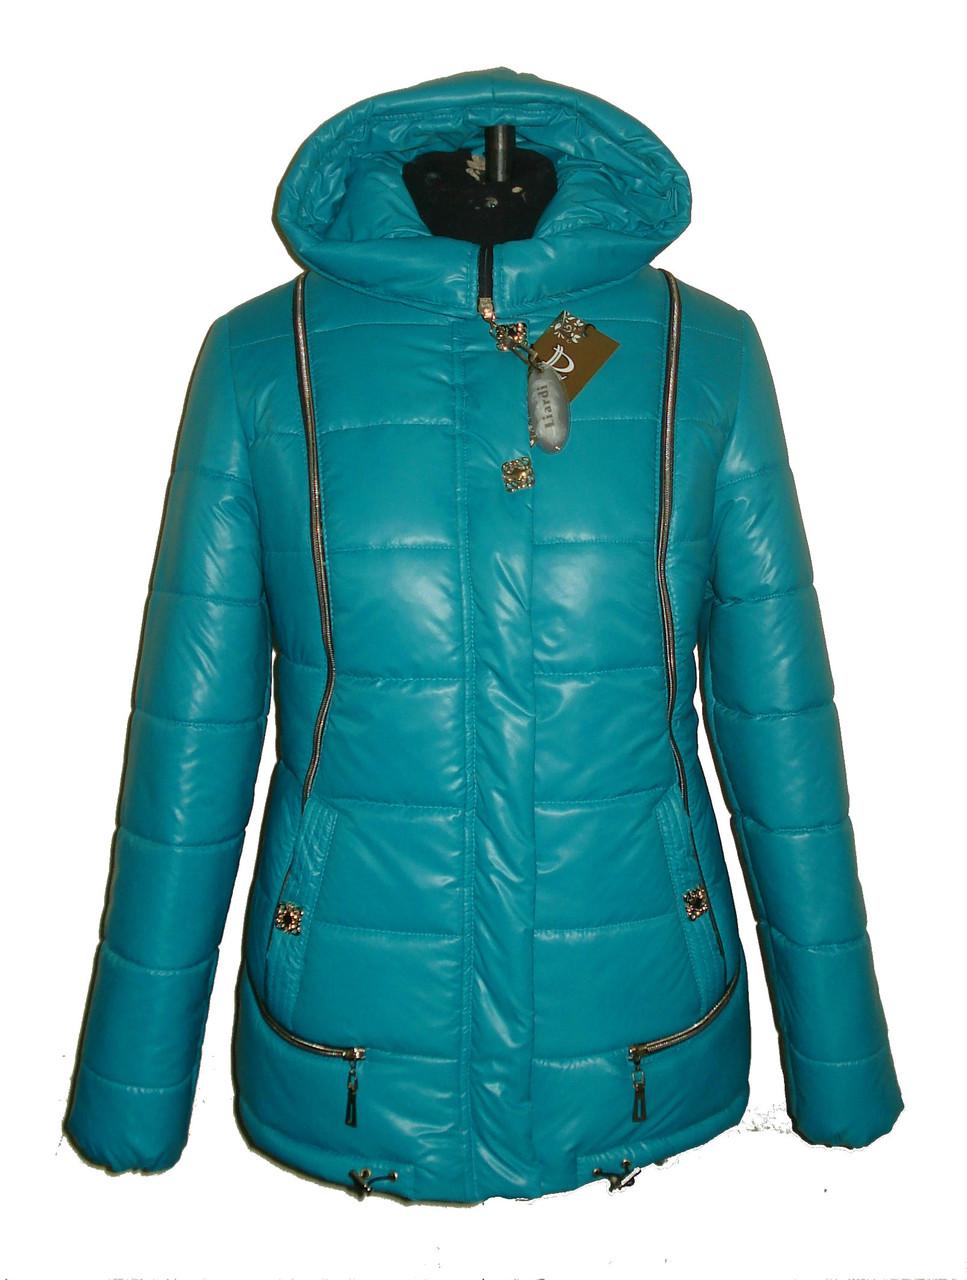 Куртка без меха от производителя Liardi